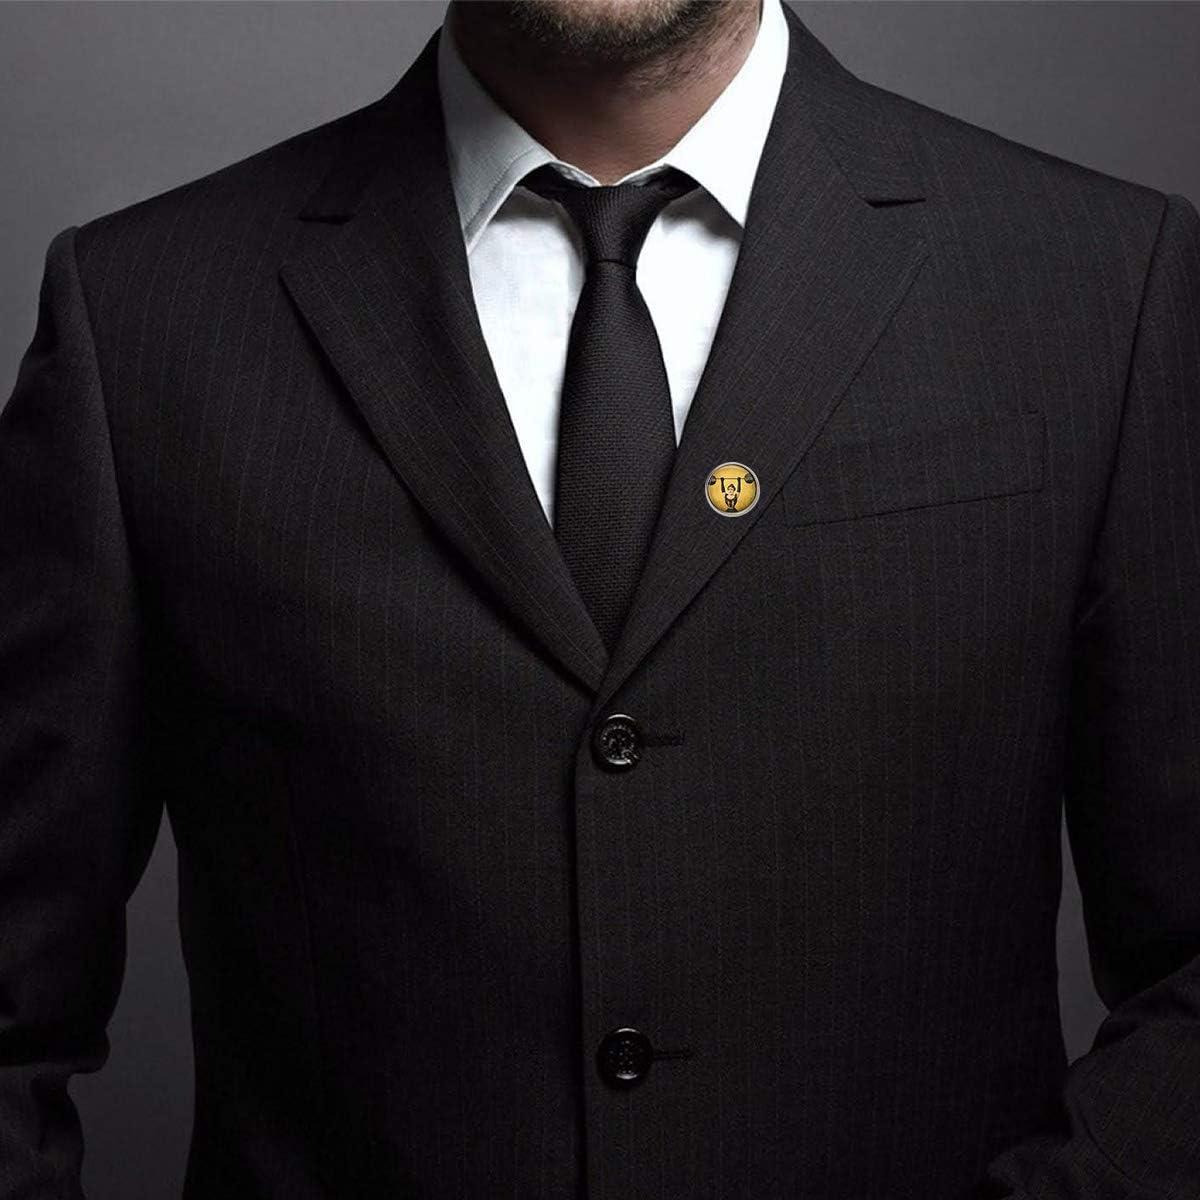 Custom Lapel Pin Brooches Weight Lifting Circus Banquet Badge Pins Trendy Accessory Jacket T-Shirt Bag Hat Shoe